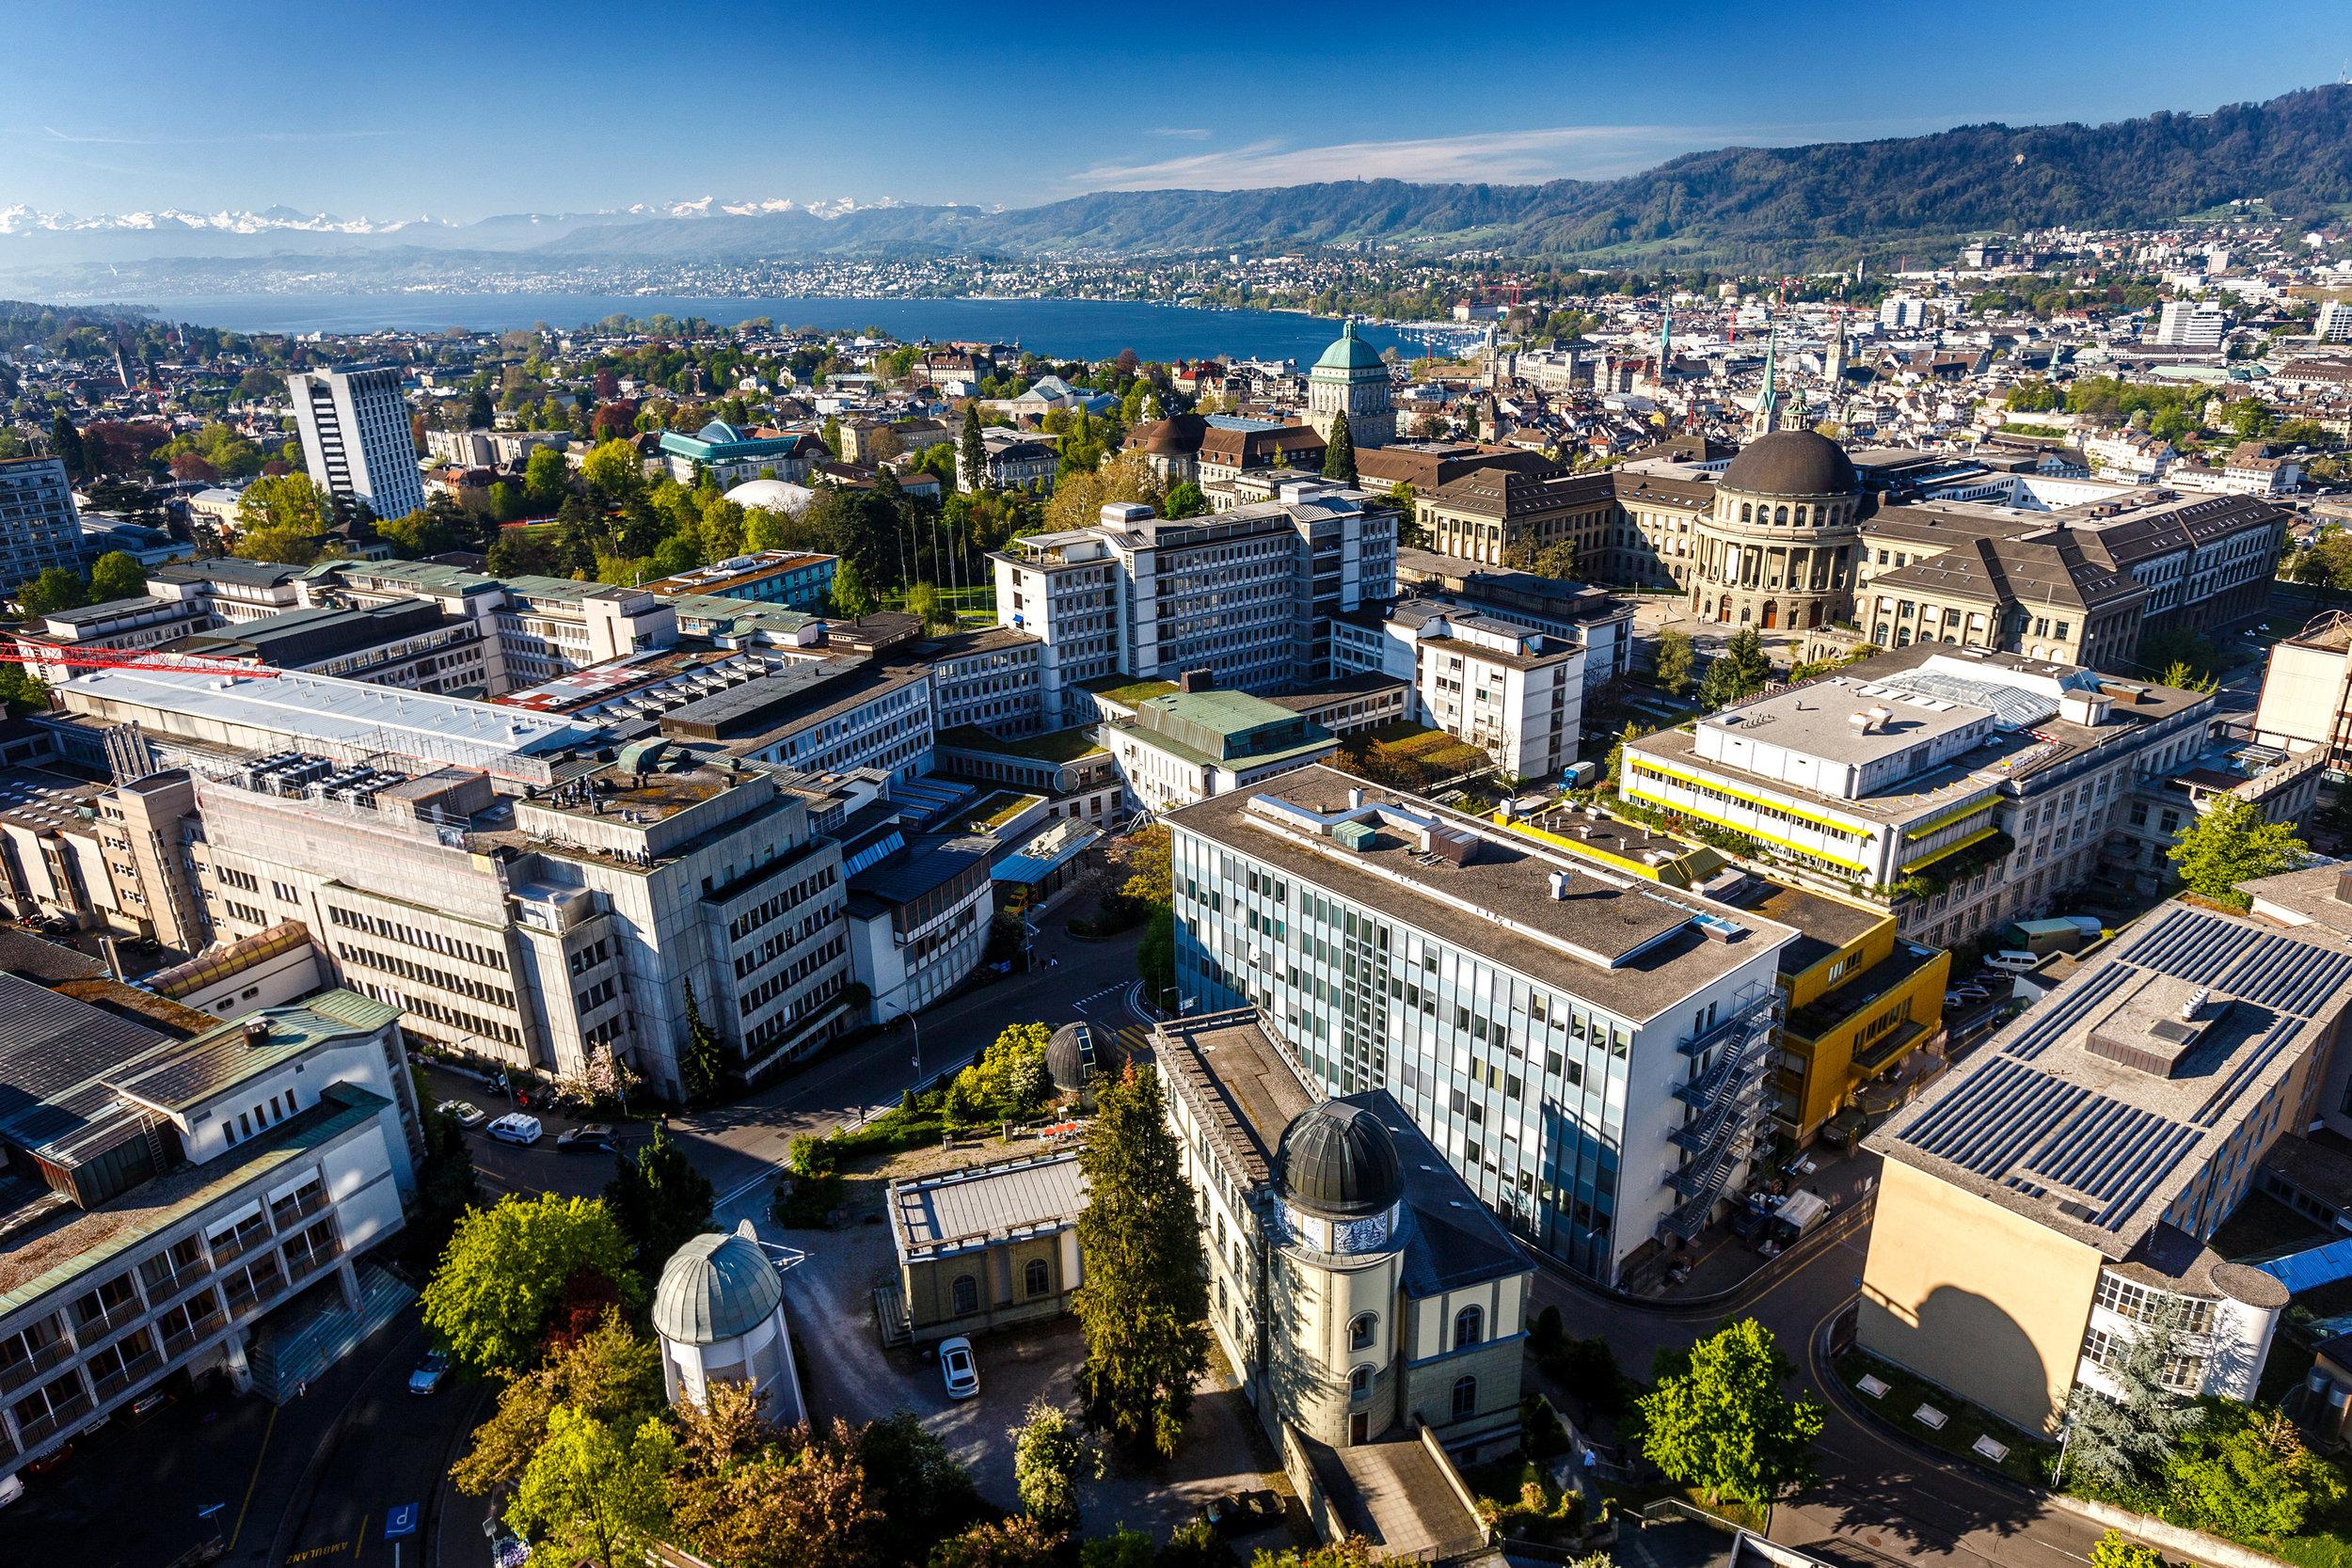 UniversitätsSpital Zürich mit Forschungspartnern Universität Zürich und ETH Zürich Foto:UniversitätsSpital Zürich